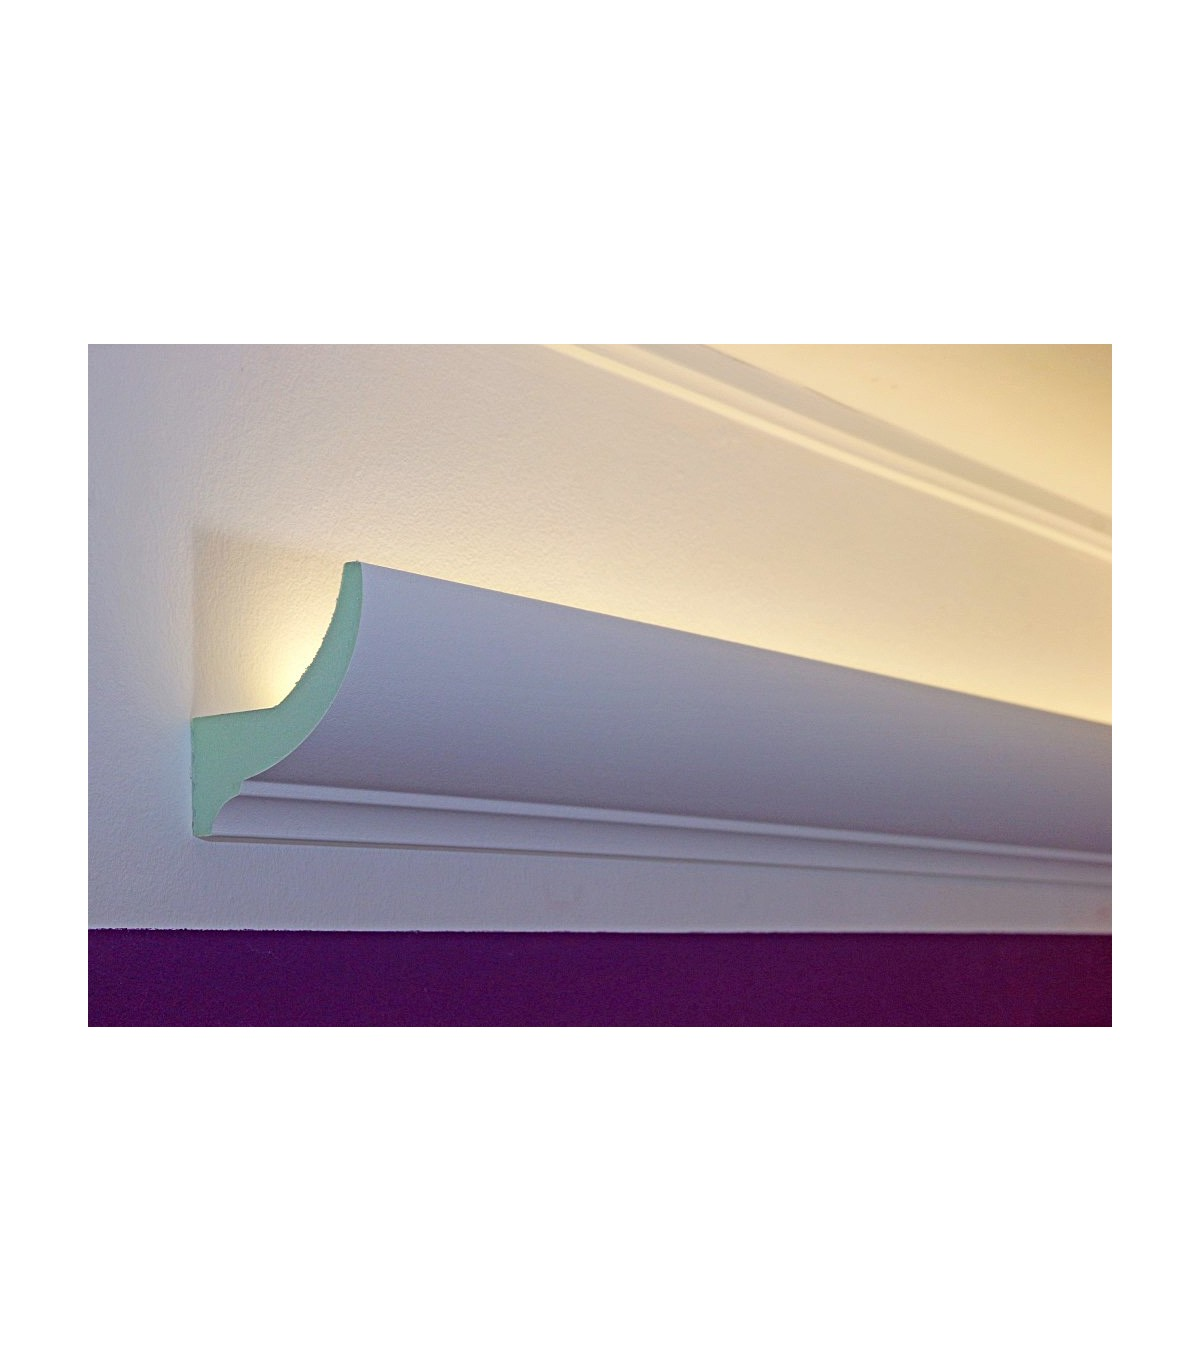 led lichtvouten dbkl 75 pr f r indirekte beleuchtung decke bendu. Black Bedroom Furniture Sets. Home Design Ideas